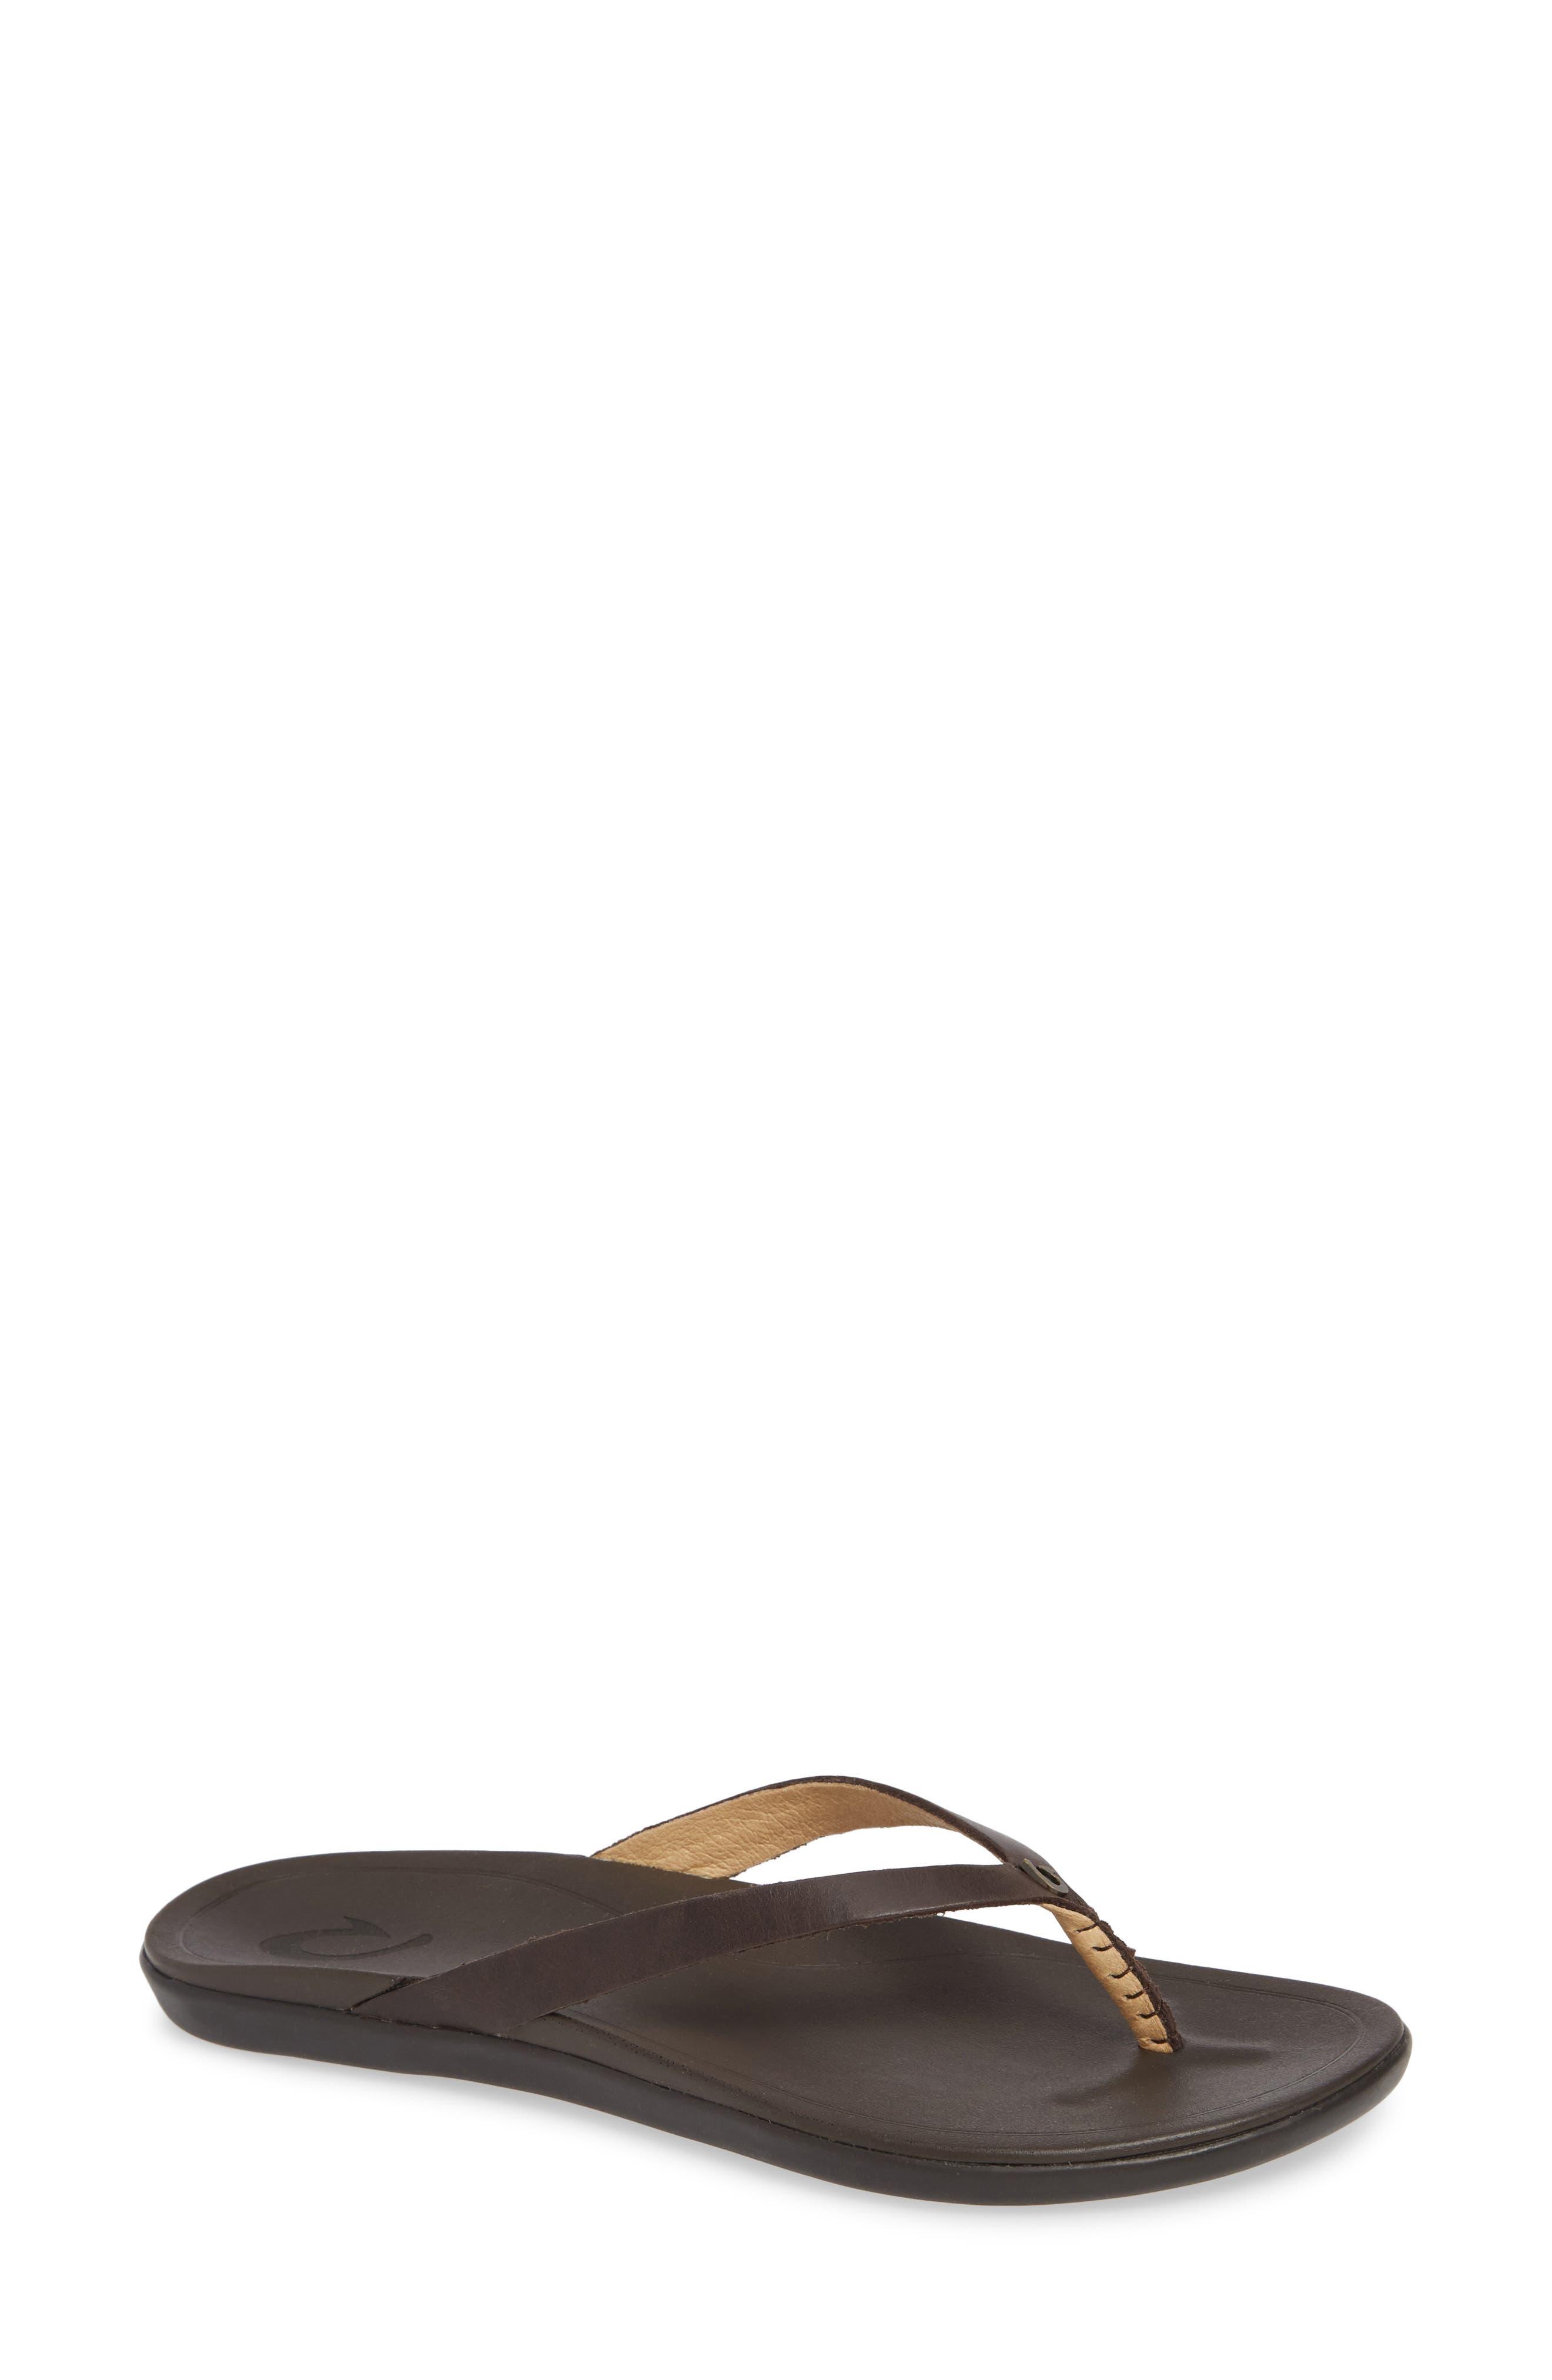 'Ho Opio' Leather Flip Flop, Main, color, DARK JAVA/ DARK JAVA LEATHER